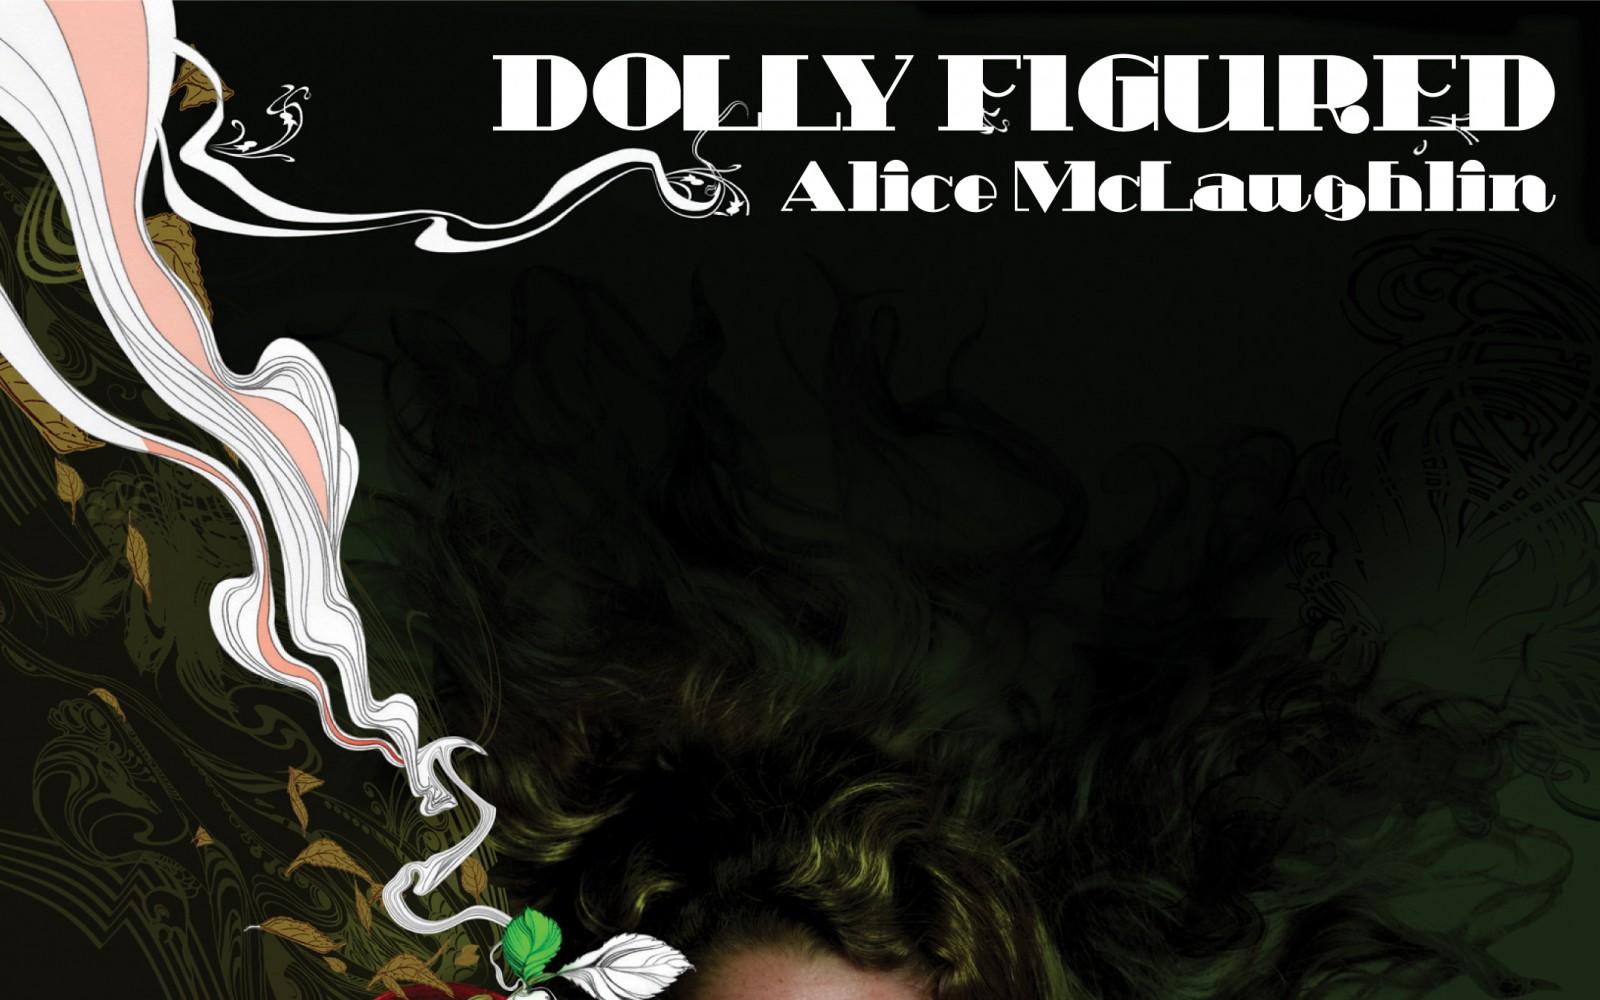 051 - SBEST51 - ALICE MCLAUGHLIN - DOLLY FIGURED